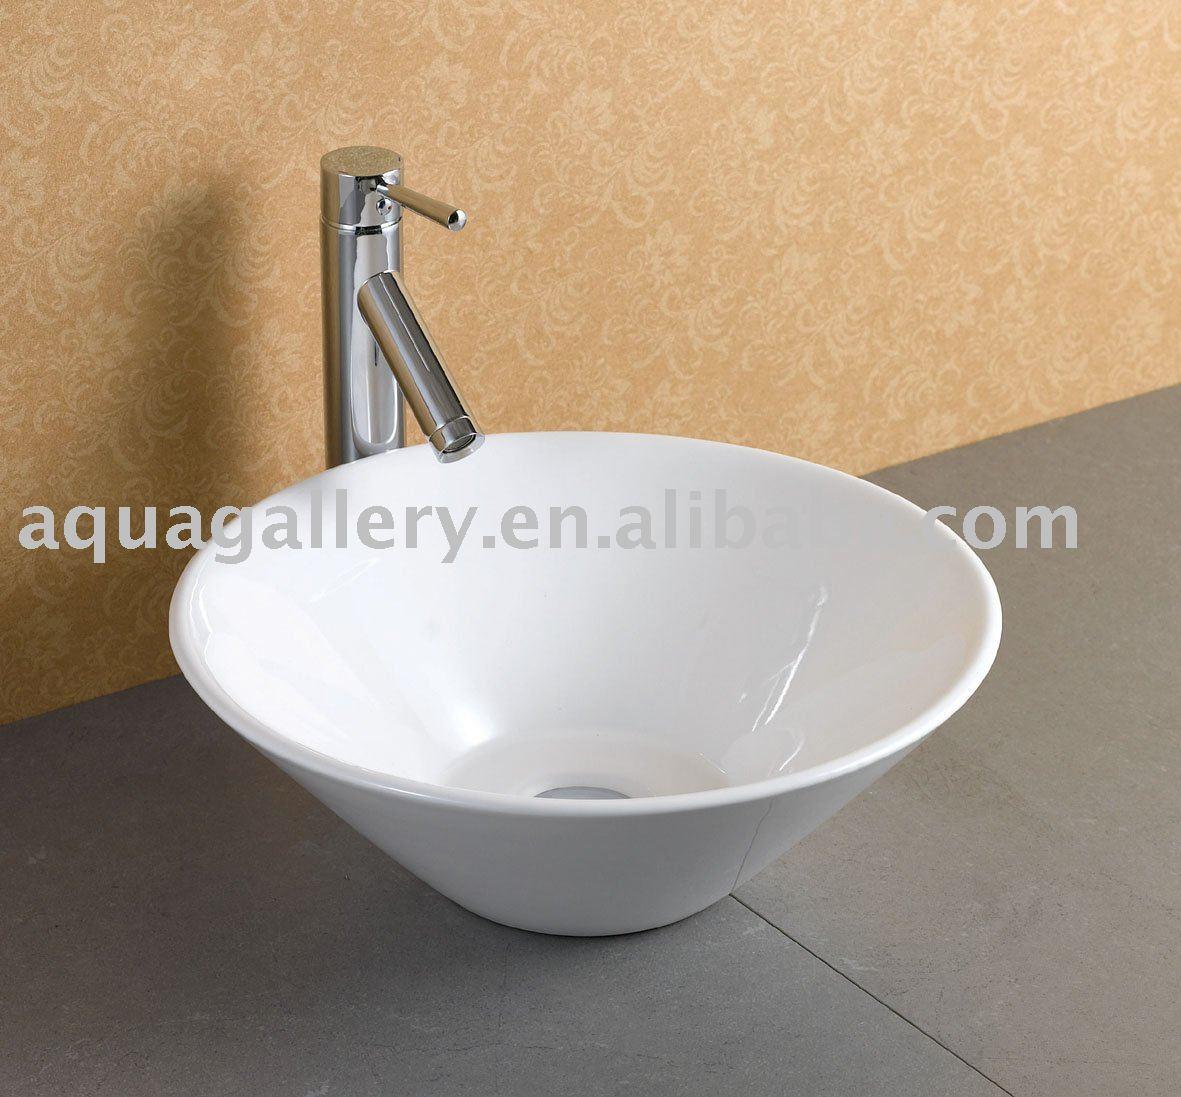 Bowl Shape Ceramic Washroom Sink - Buy Washroom Sink,Ceramic Art Basin ...